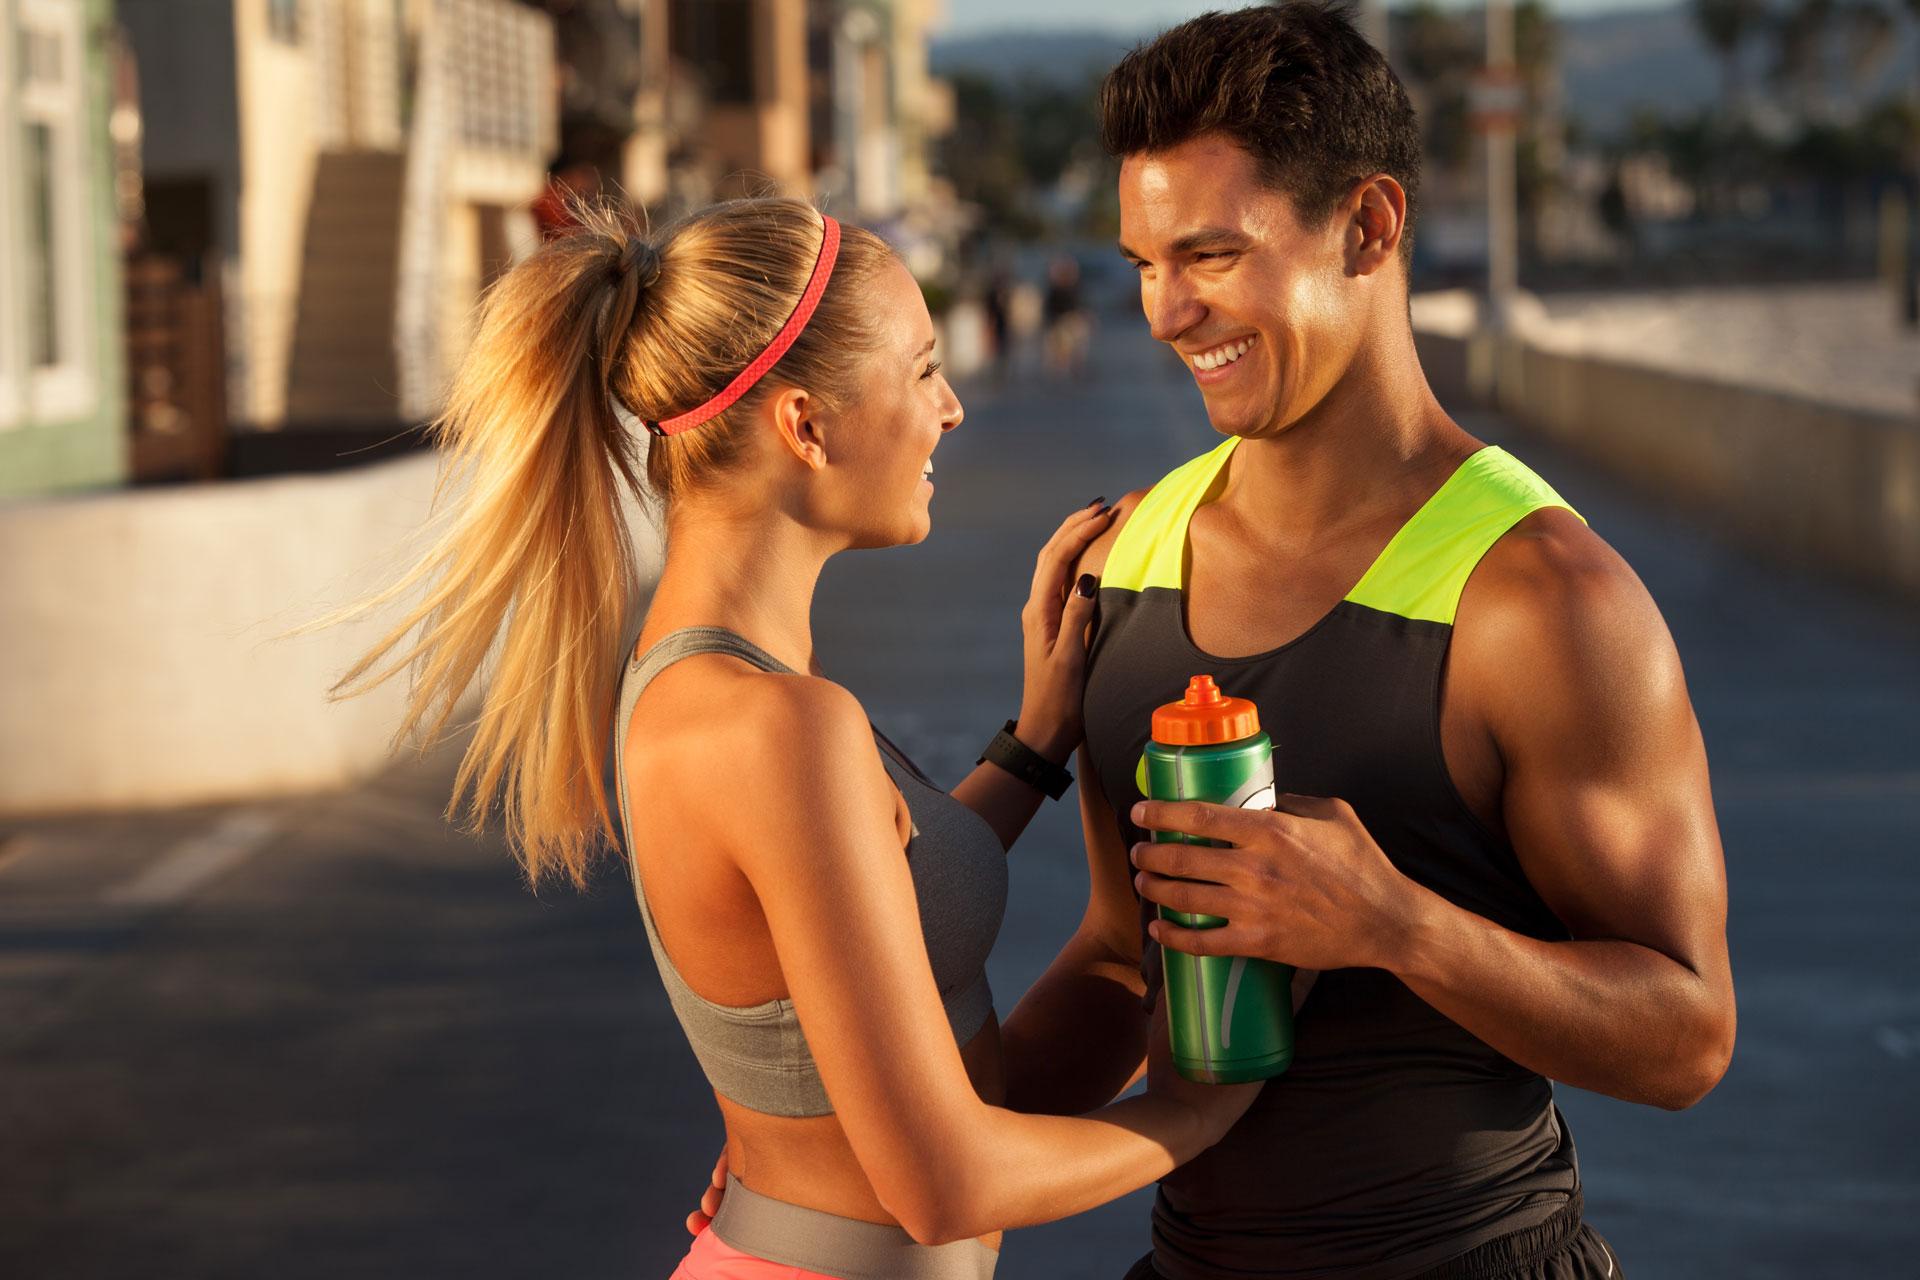 Workout Together